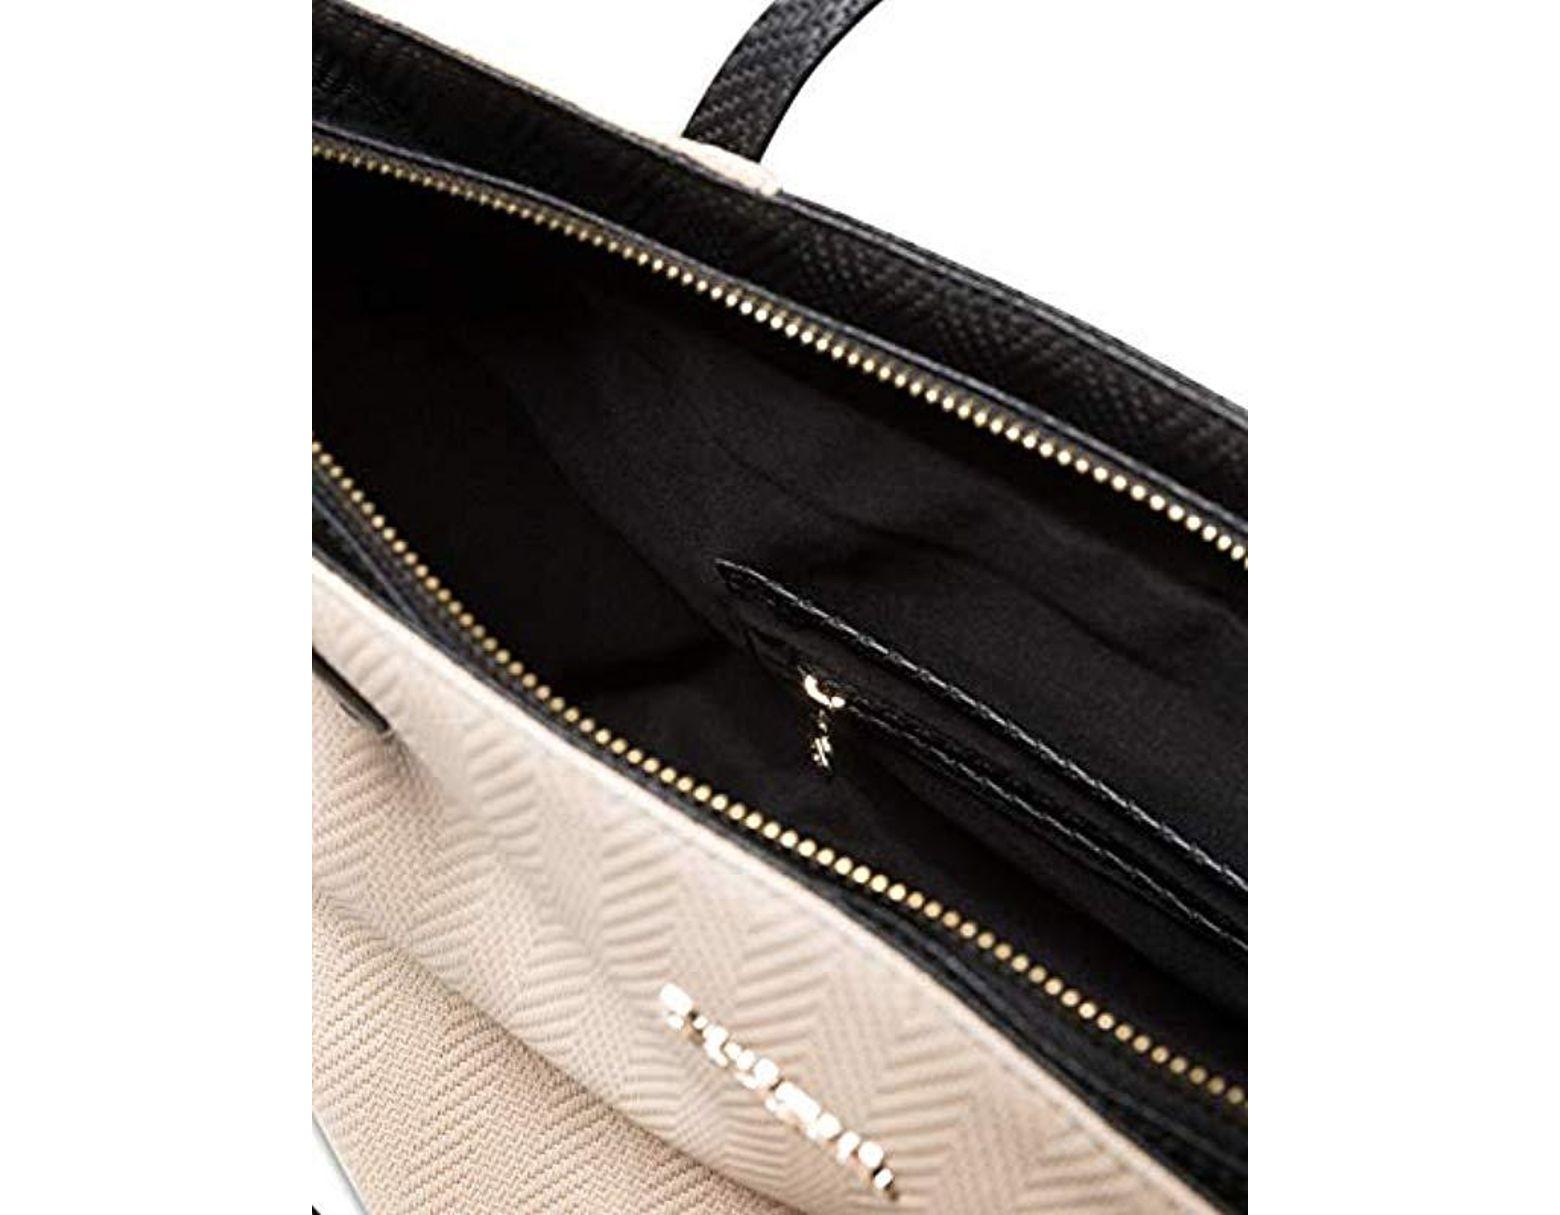 De Blanc Zipper Neutre Lady Capri Sac Coloris Femme FKlJ3T1c